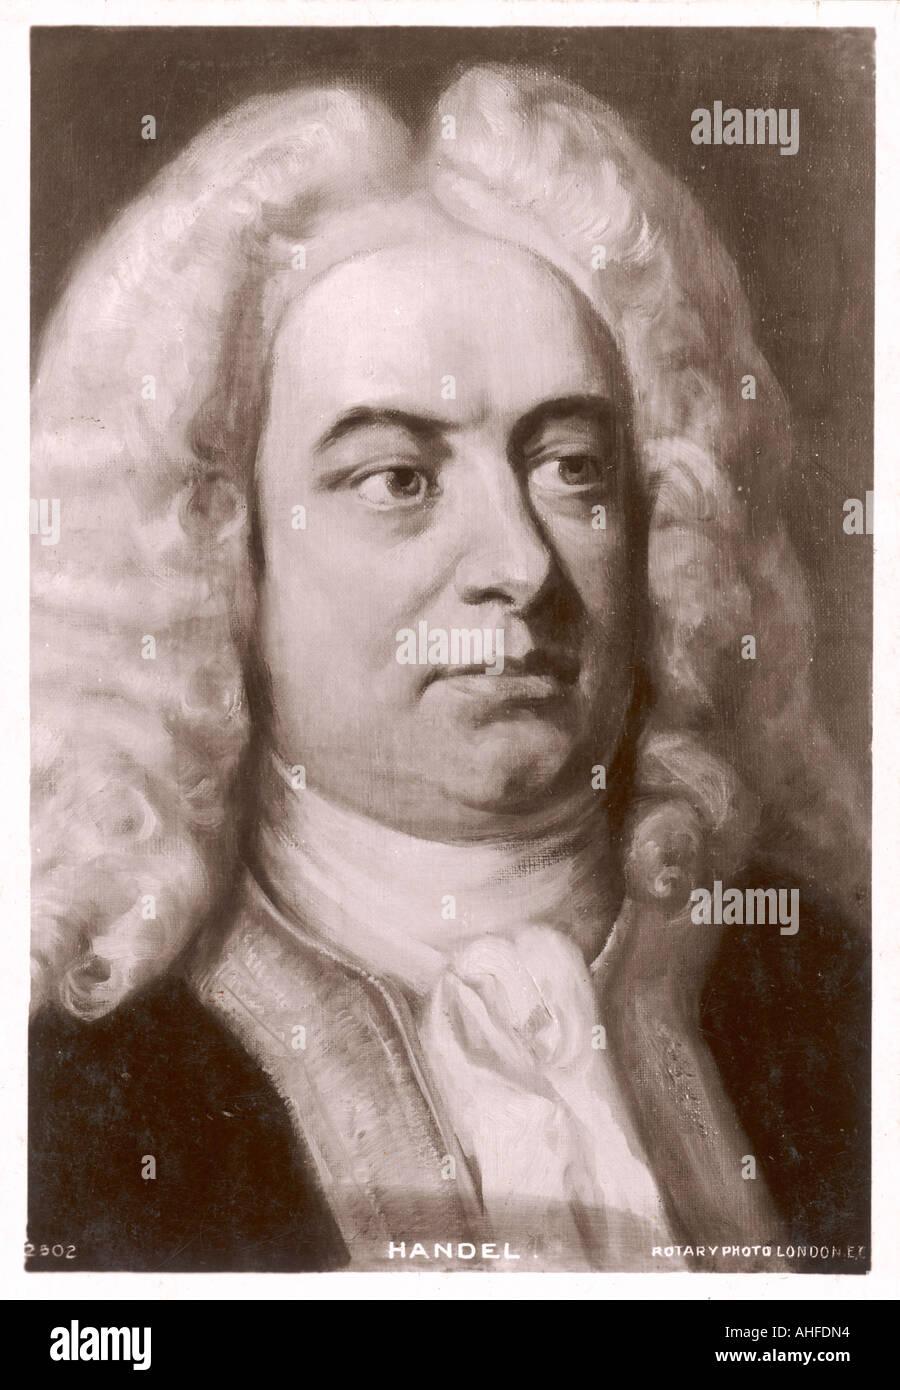 Händel-Postkarte Stockbild